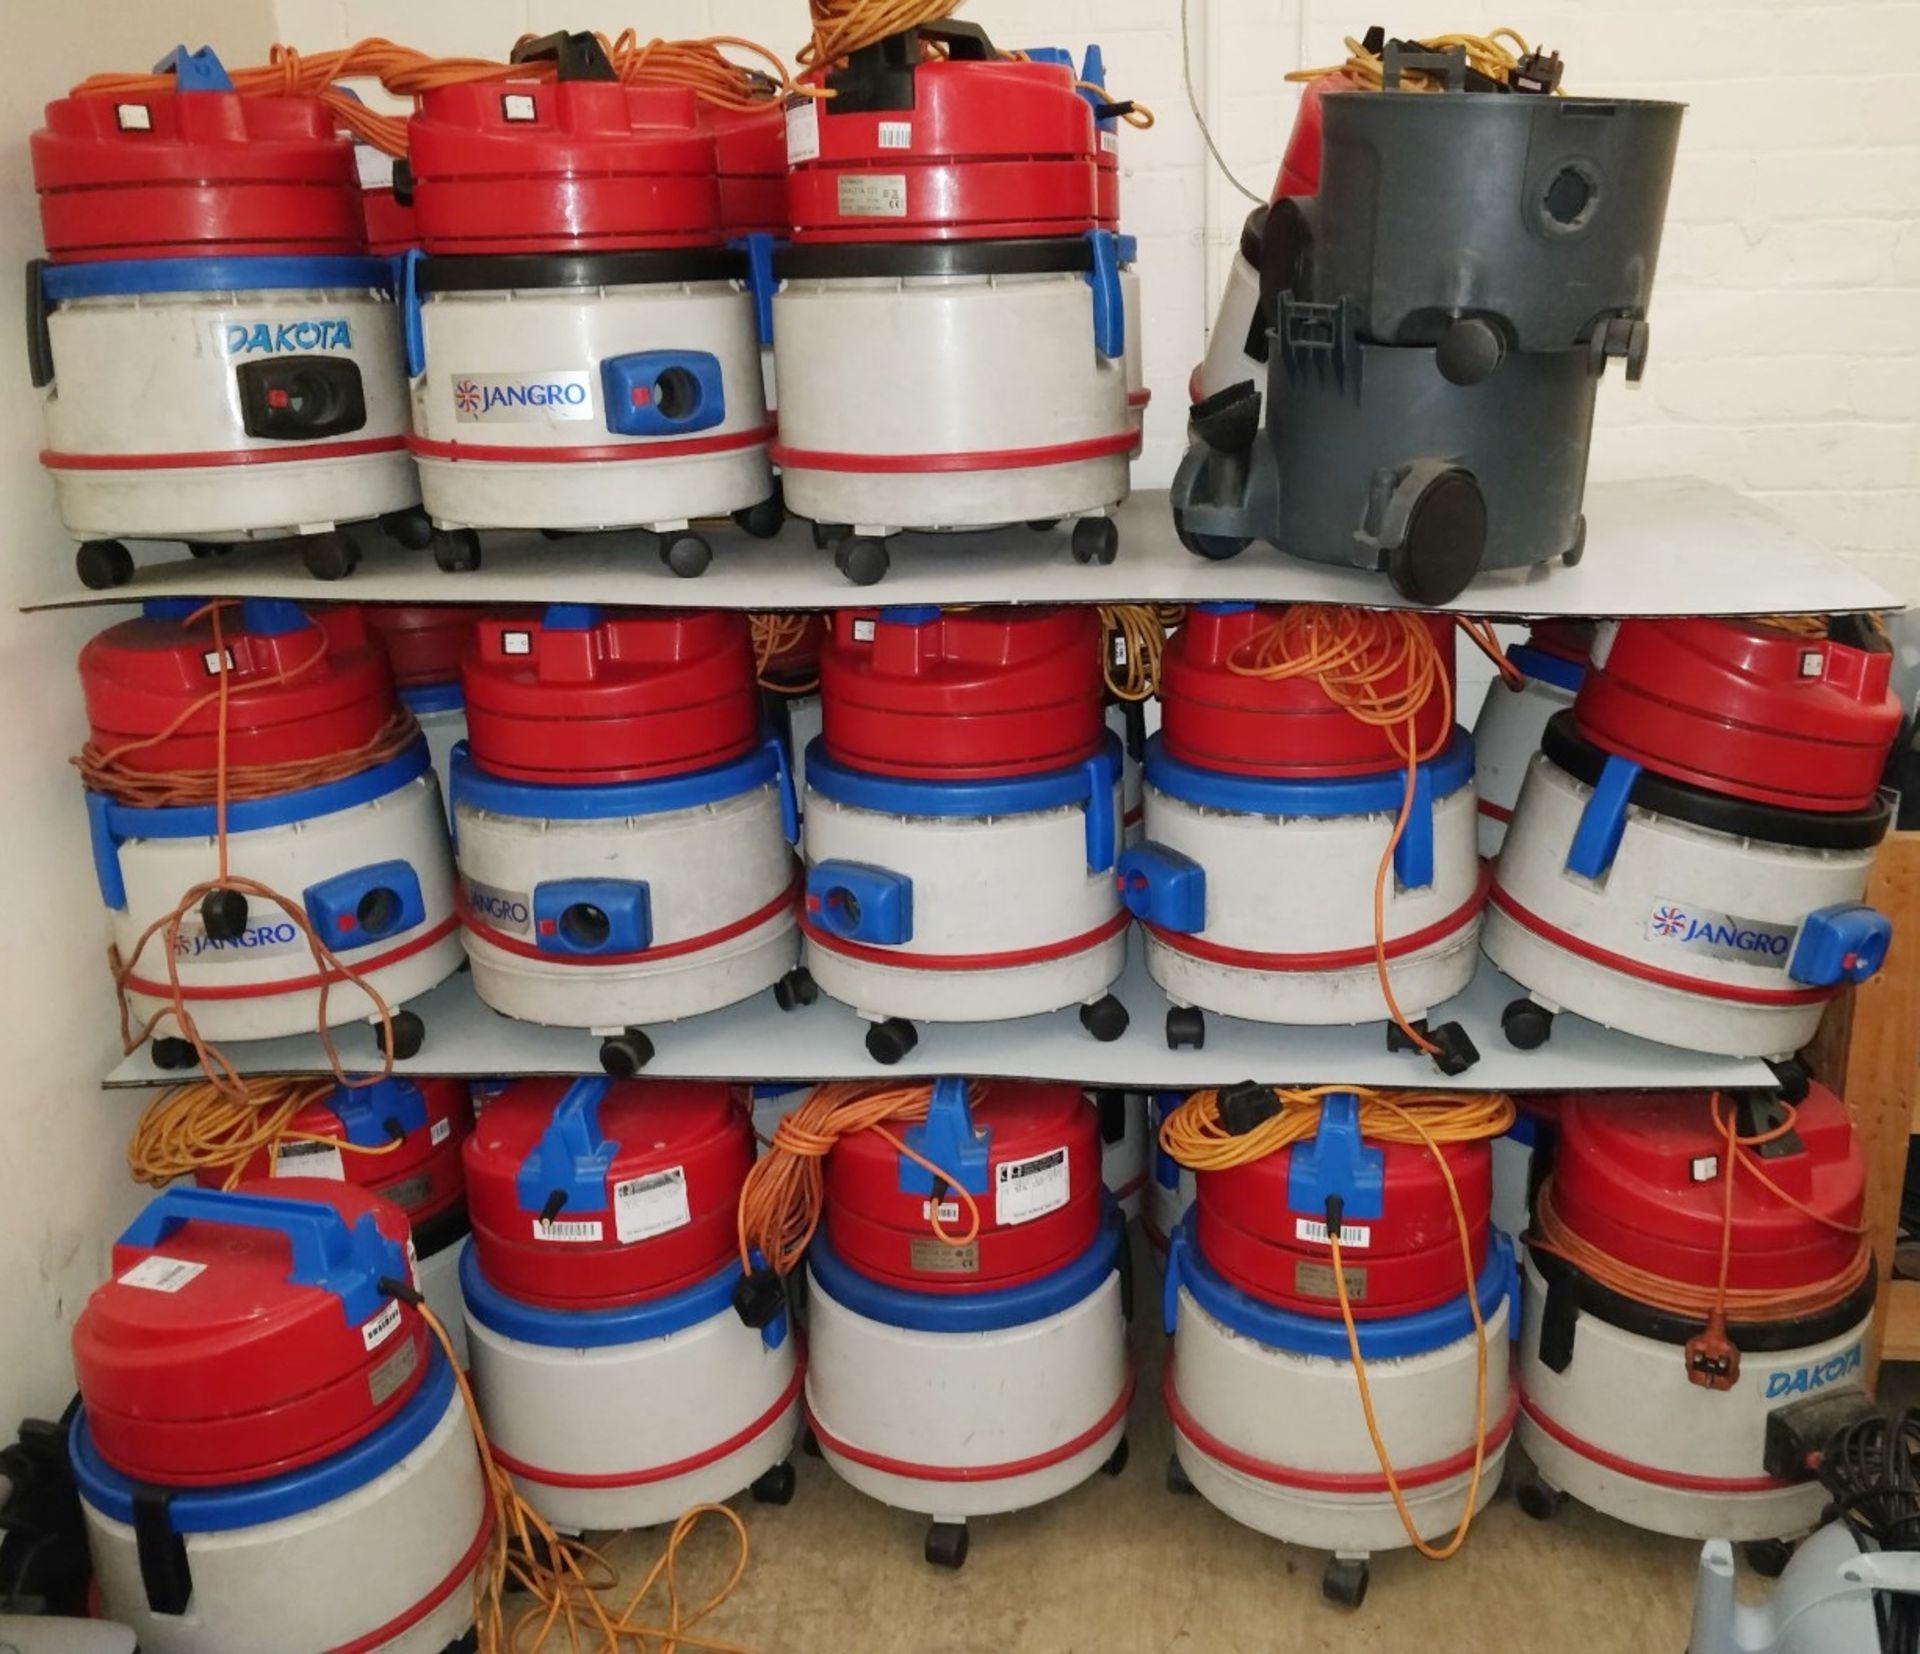 Lot 6 - 4 x Dakota 101 Soteco D2 800w Vacuum Cleaners - Ref B2 CL409 - Location: Wakefield WF16Provided with